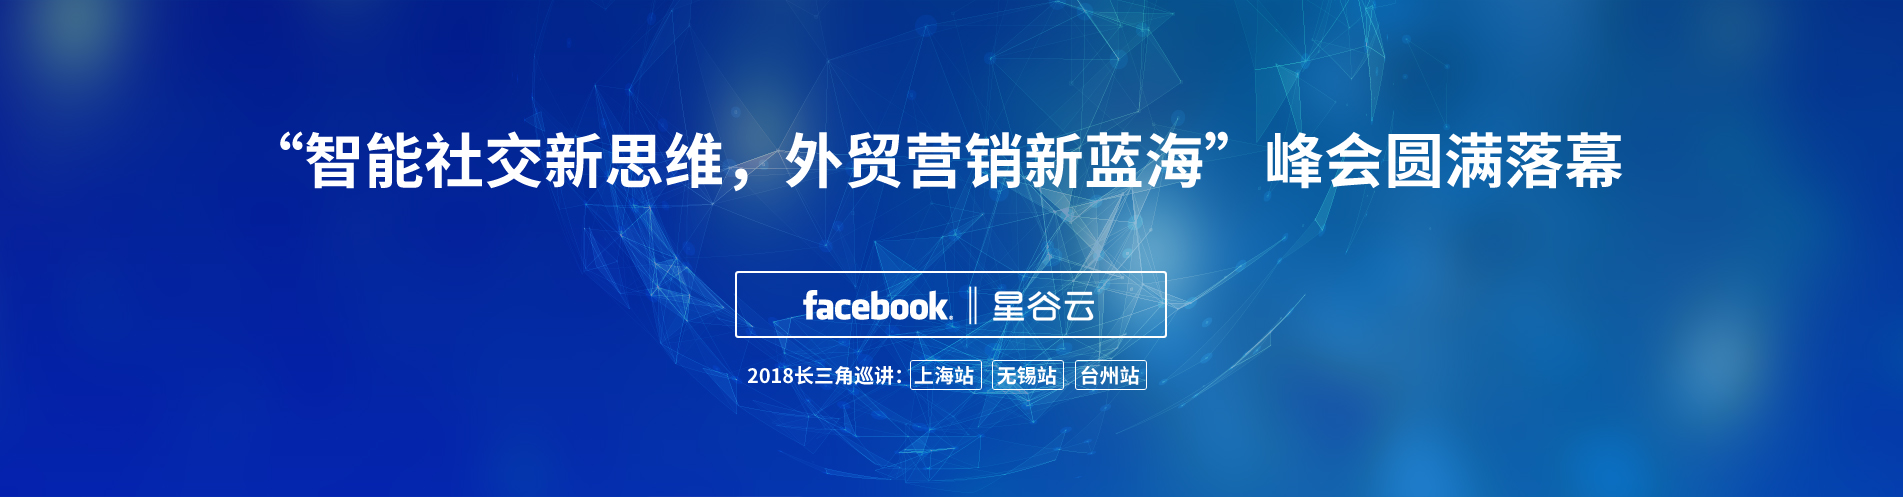 Facebook会议三城巡讲圆满落幕!